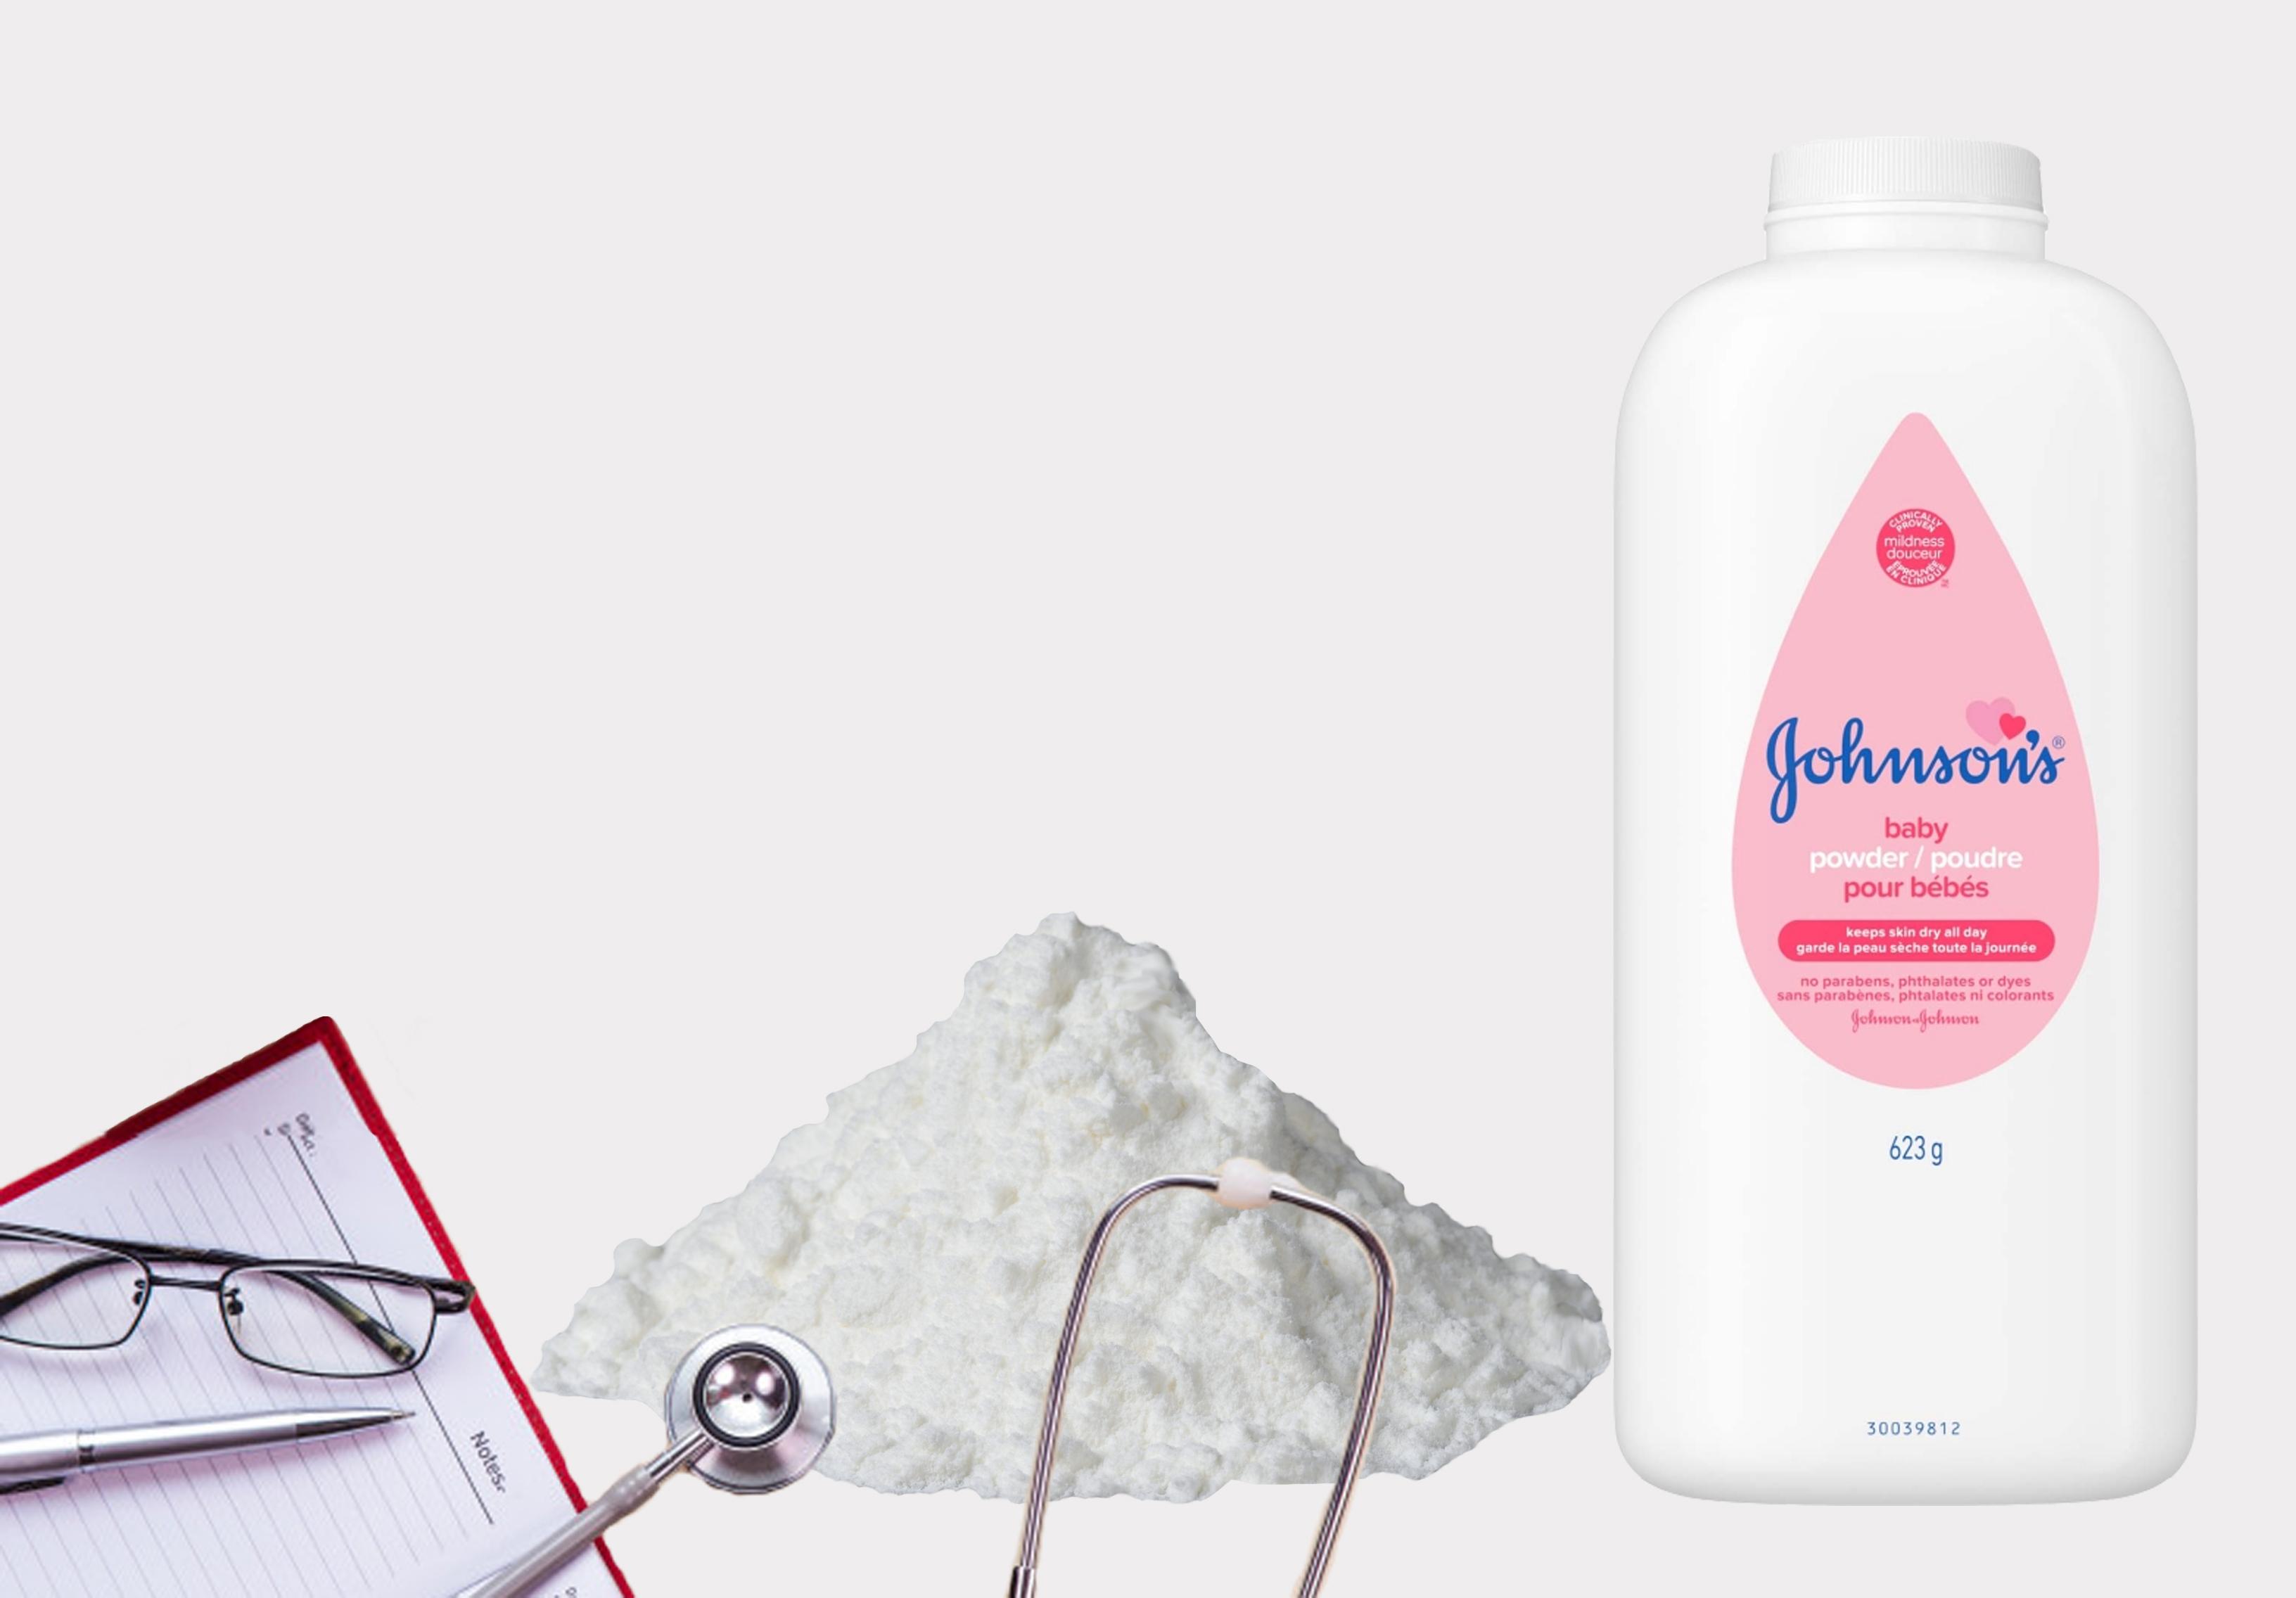 Report States Johnson & Johnson Targeted Minority Overweight Women for its Asbestos-laden Talc